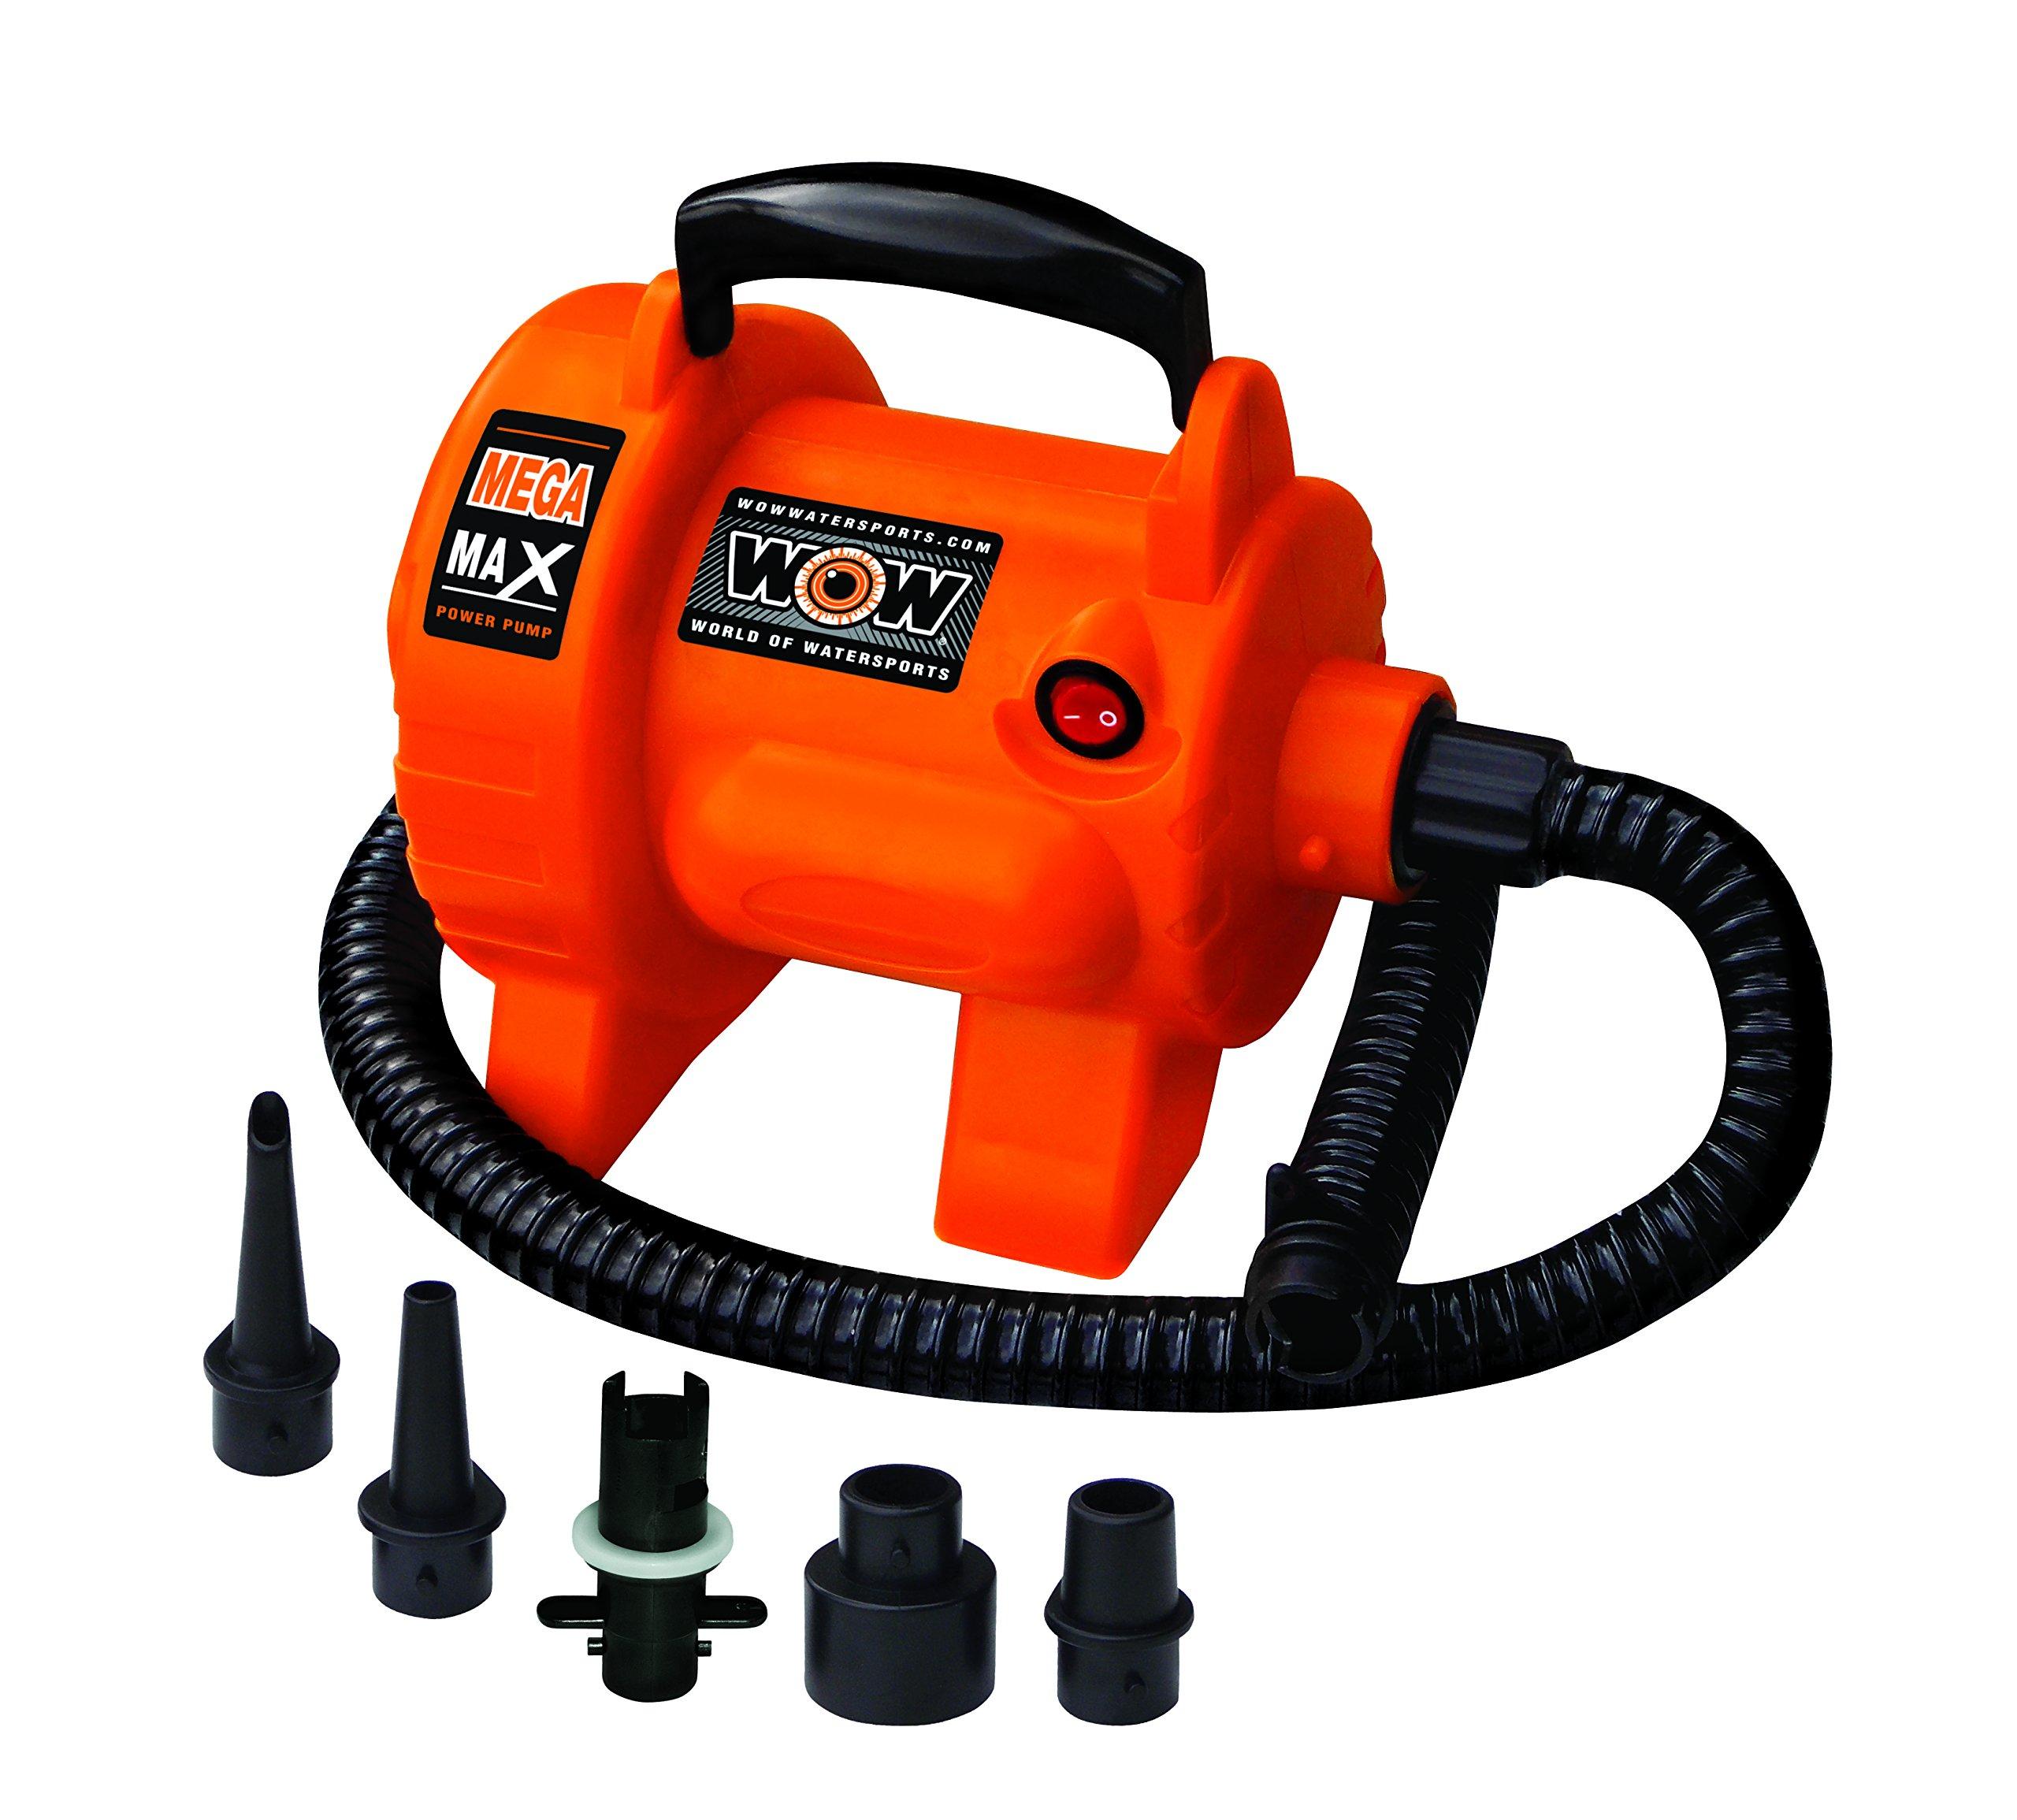 WoW World of Watersports 16-4000, Mega Max 120 Volt Electric Air Pump, 12 Foot Cord, High Pressure